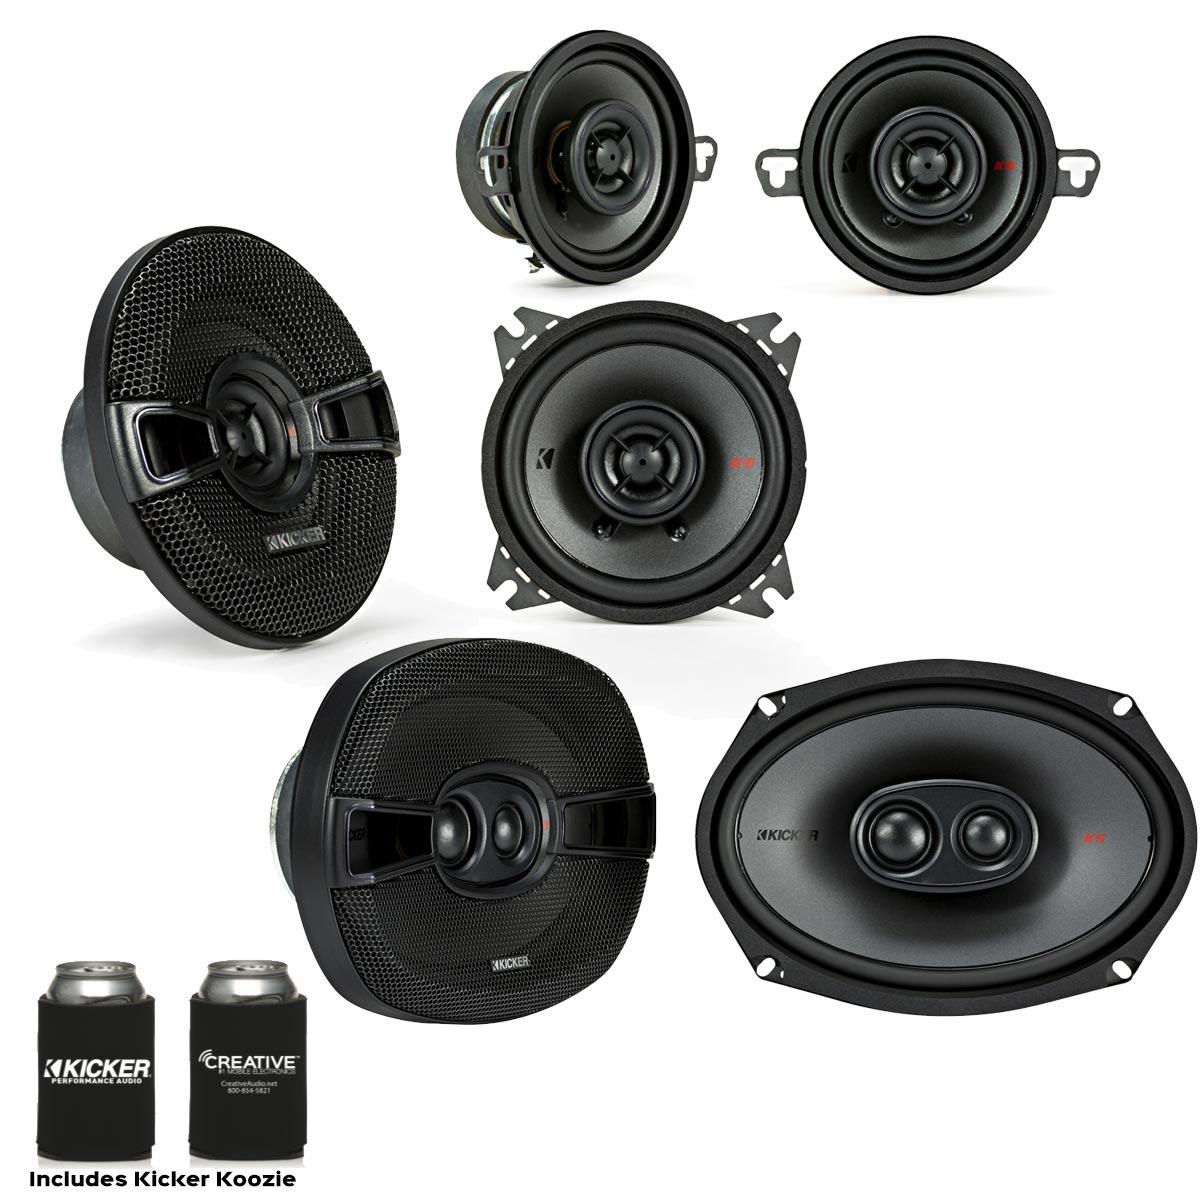 "Kicker for Dodge Ram 2002-2011 speaker bundle - 2017 Model KS 6x9"" speakers, KS 5.25"" speakers & KS 3.5"" Speakers."